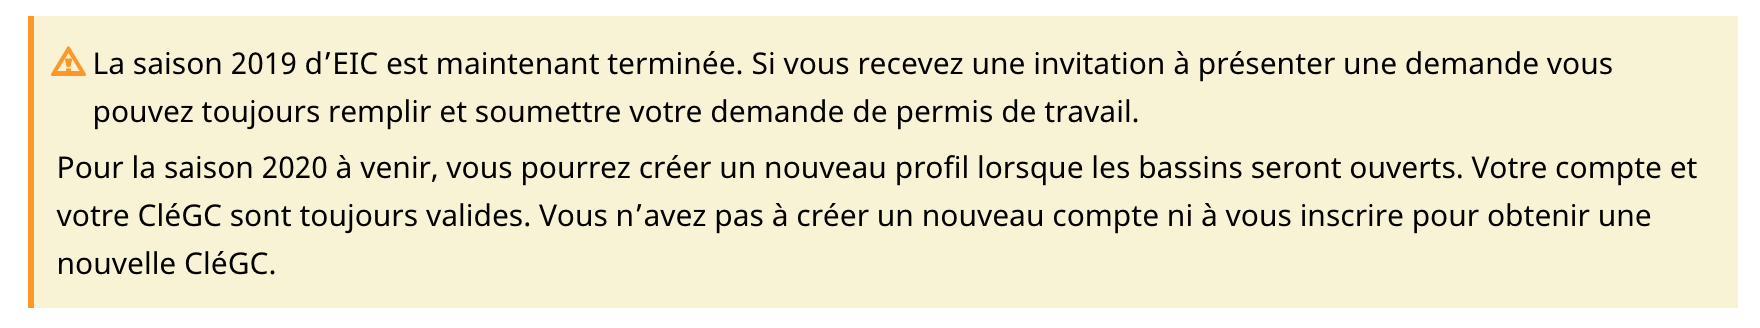 Fermeture-saison-pvt-canada-2019